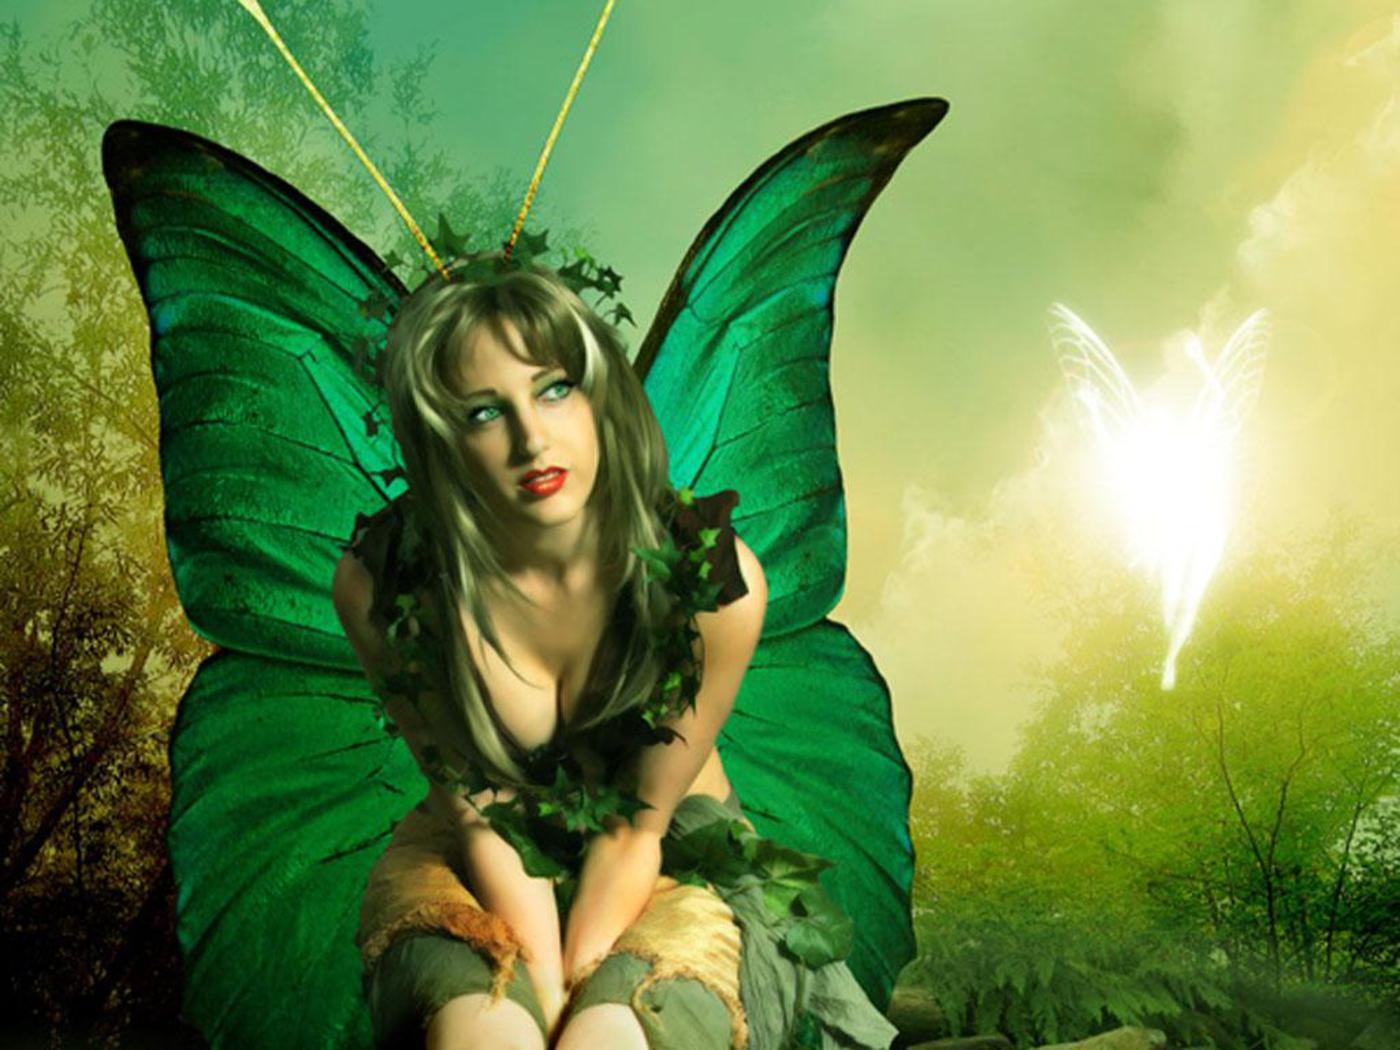 Hd fairy wallpaper wallpapersafari fairy angel wallpaper 1400x1050 full hd green butterfly fairy angel hd 1400x1050 voltagebd Gallery